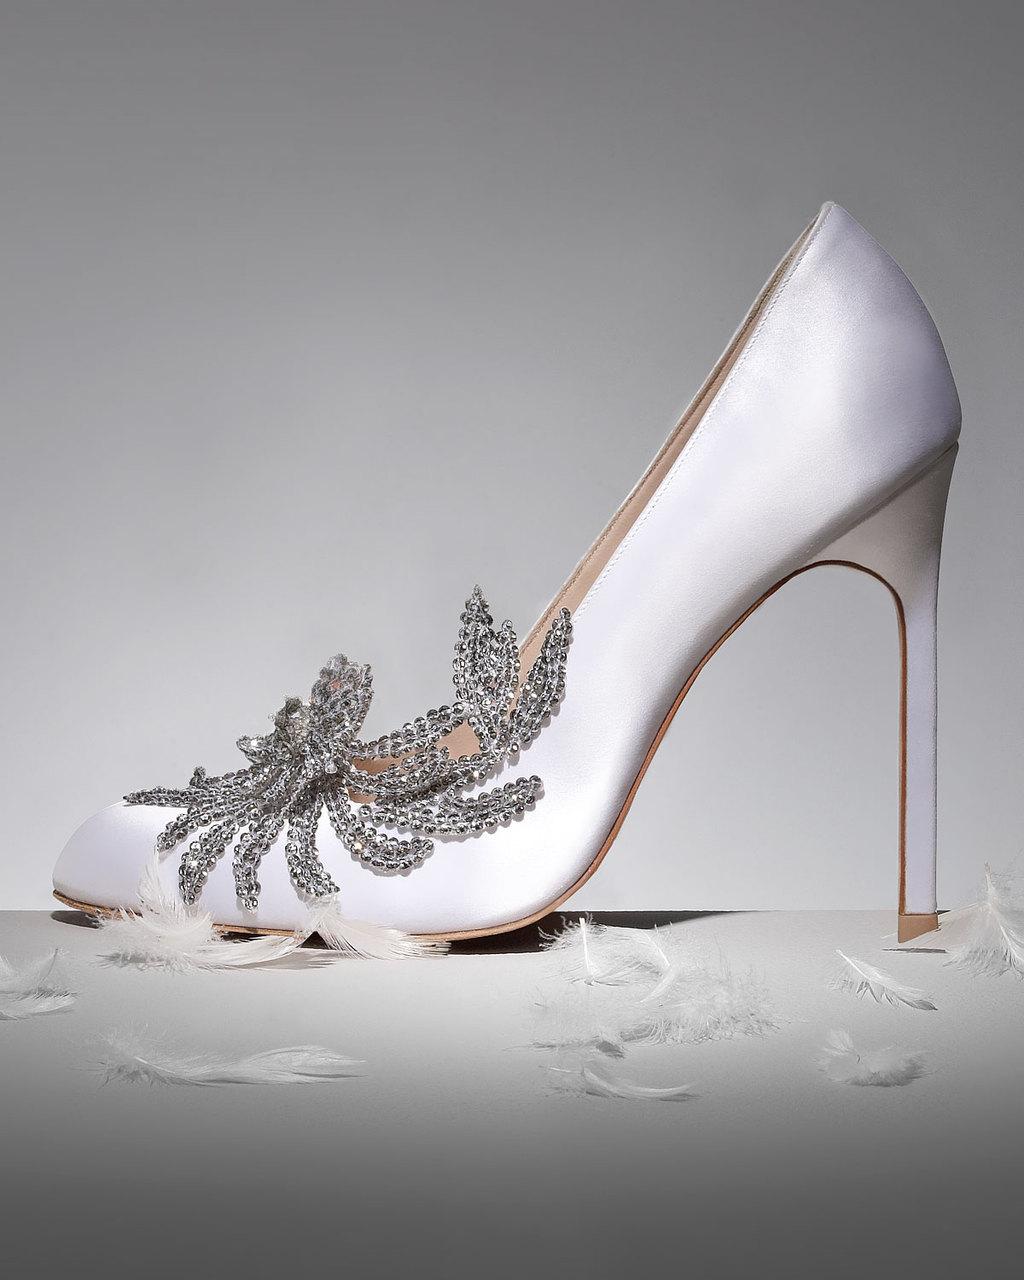 Wedding-splurge-top-10-for-fall-2012-manolo-blahnik-white-satin-pumps.full